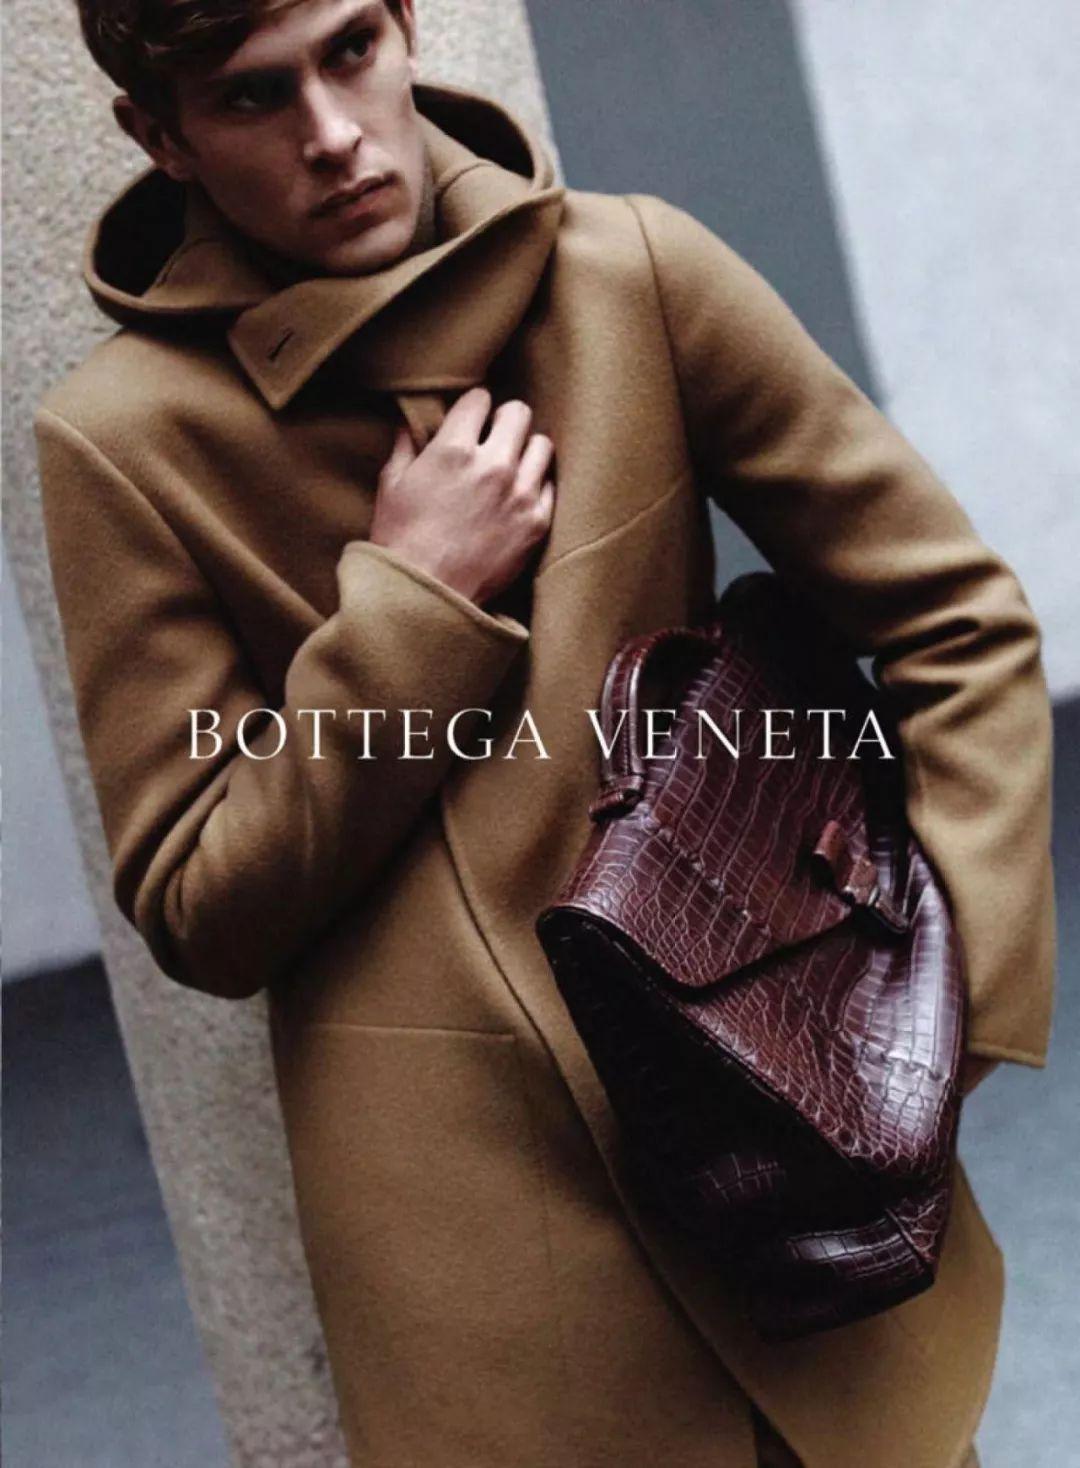 75fc42a89ef44d60894dbee38e002dfa - 易烊千玺不够资格代言Bottega Veneta?他其实是品牌最好的选择!